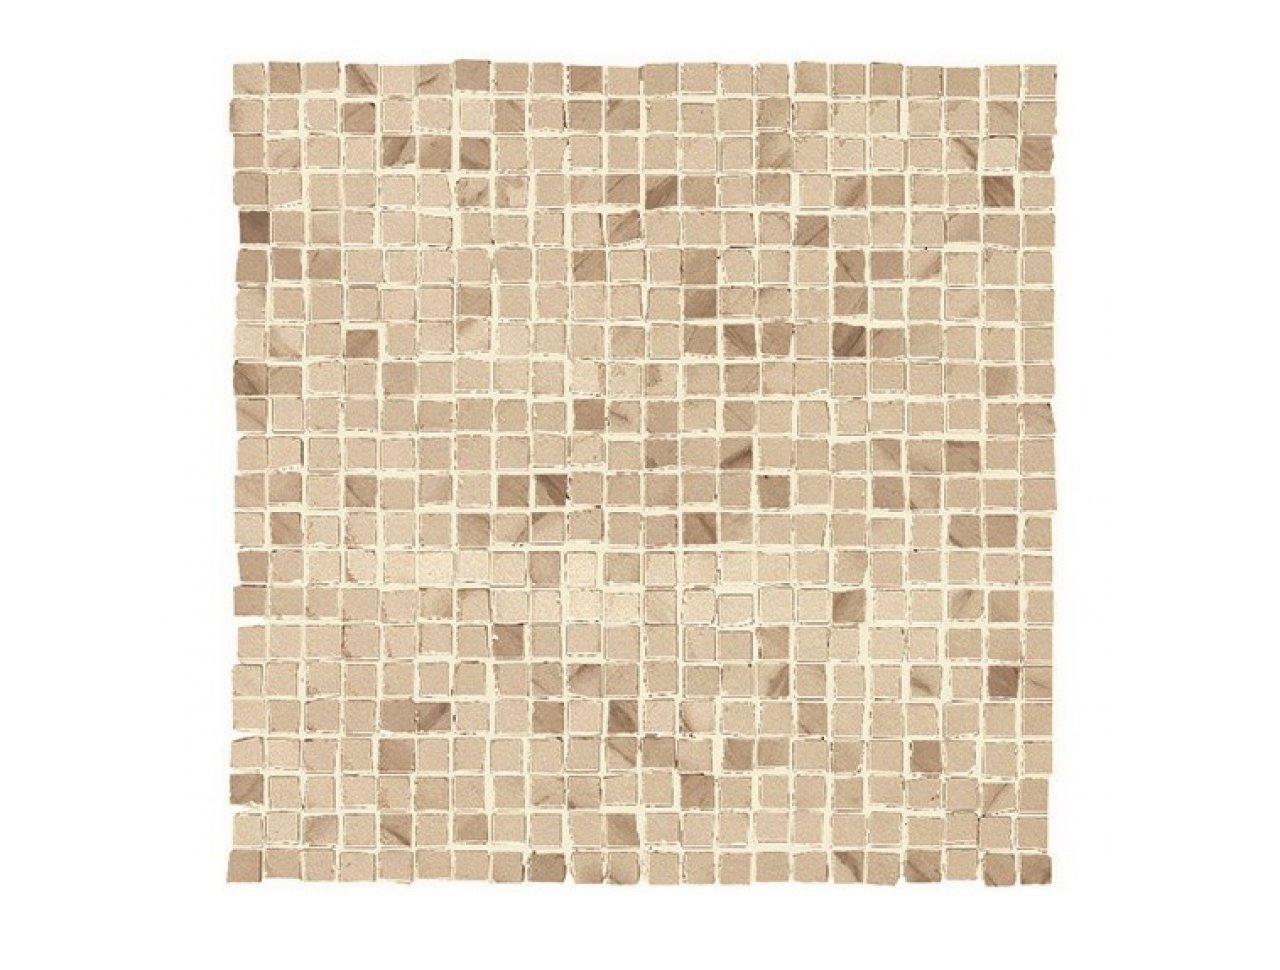 Мозаика FAP Roma Travertino Micromosaico 30.5 x 30.5 см, Арт. fLYU